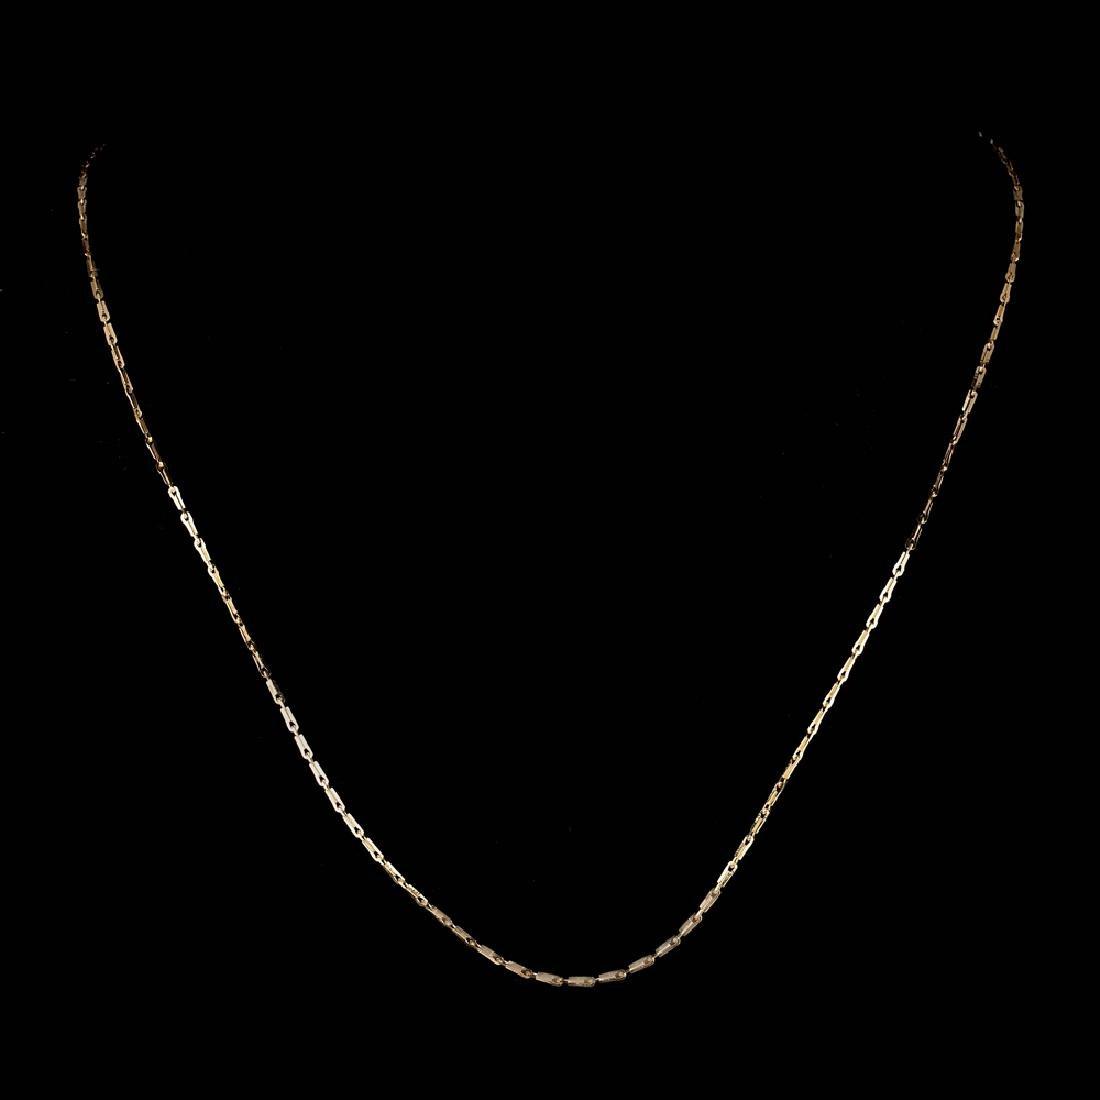 *Fine Jewelry 14 KT Gold, 2.1GR, 18'' Pinsetta Chain